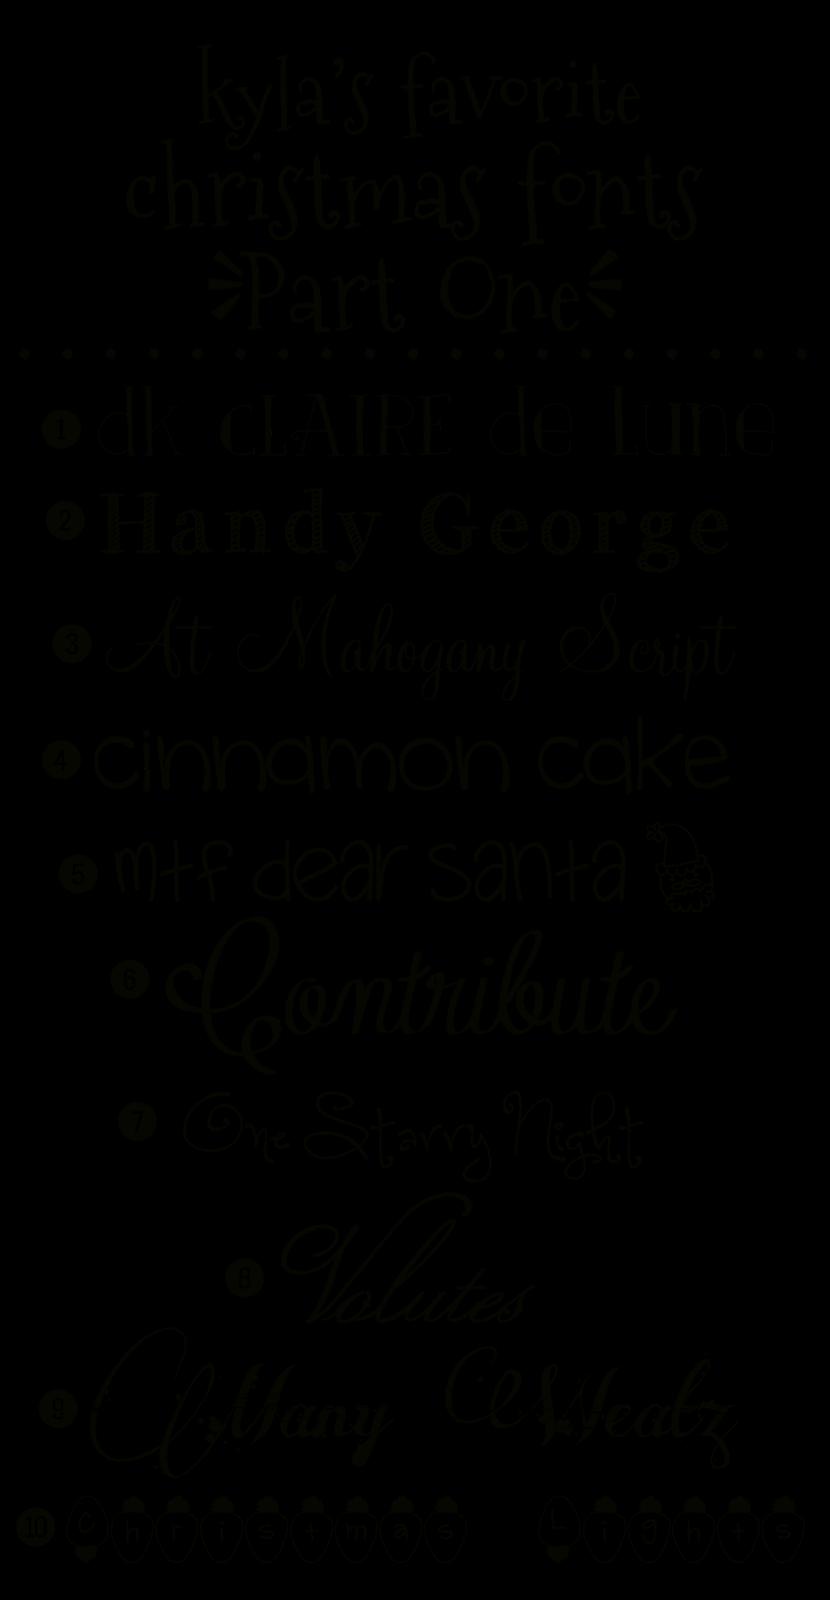 Christmas Fonts.Funky Polkadot Giraffe Kyla S Favorite Christmas Fonts